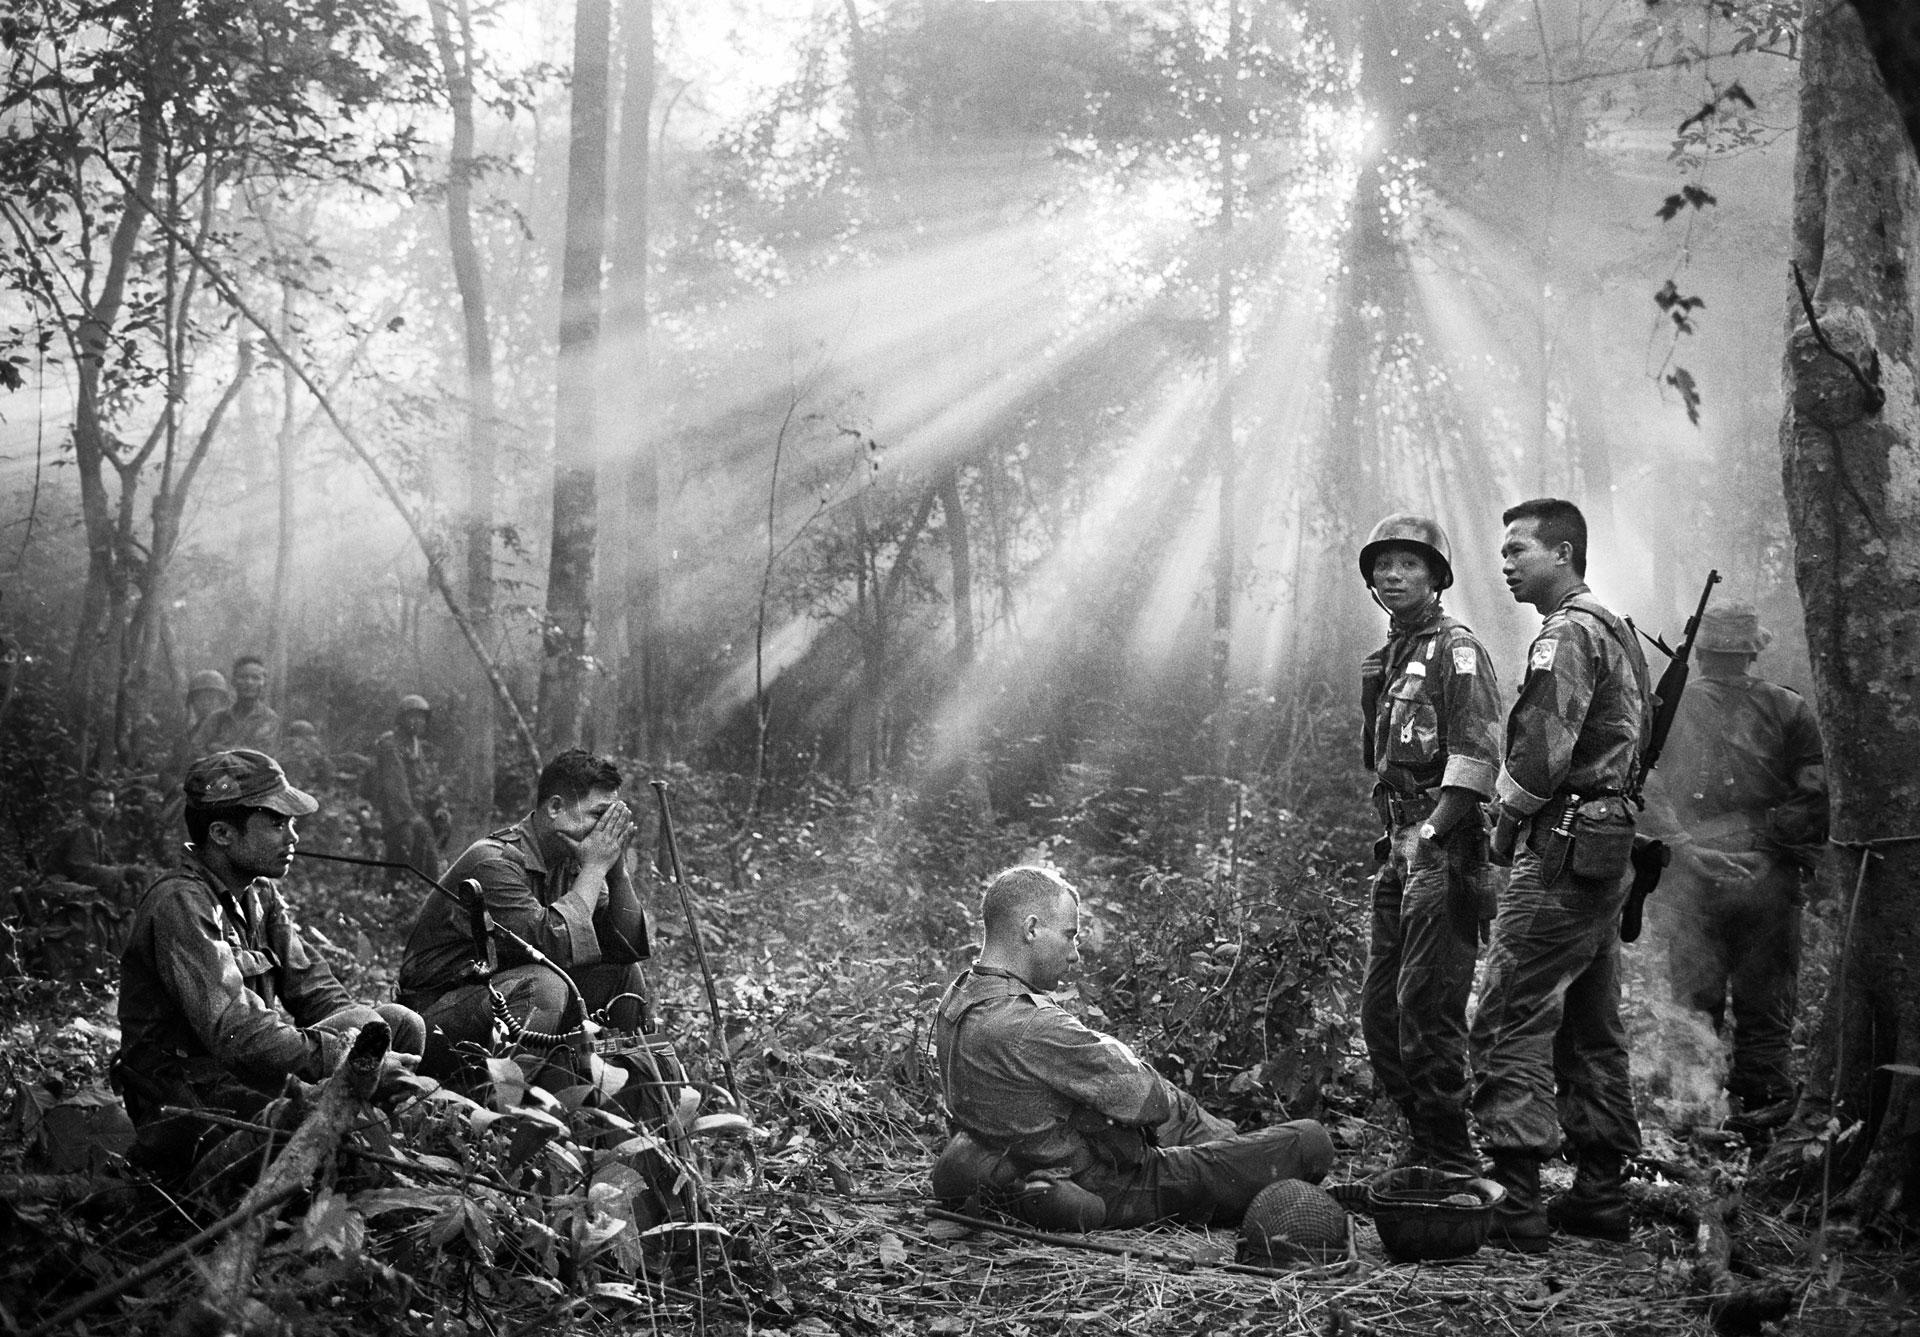 Vietnam war australian soldiers experiences